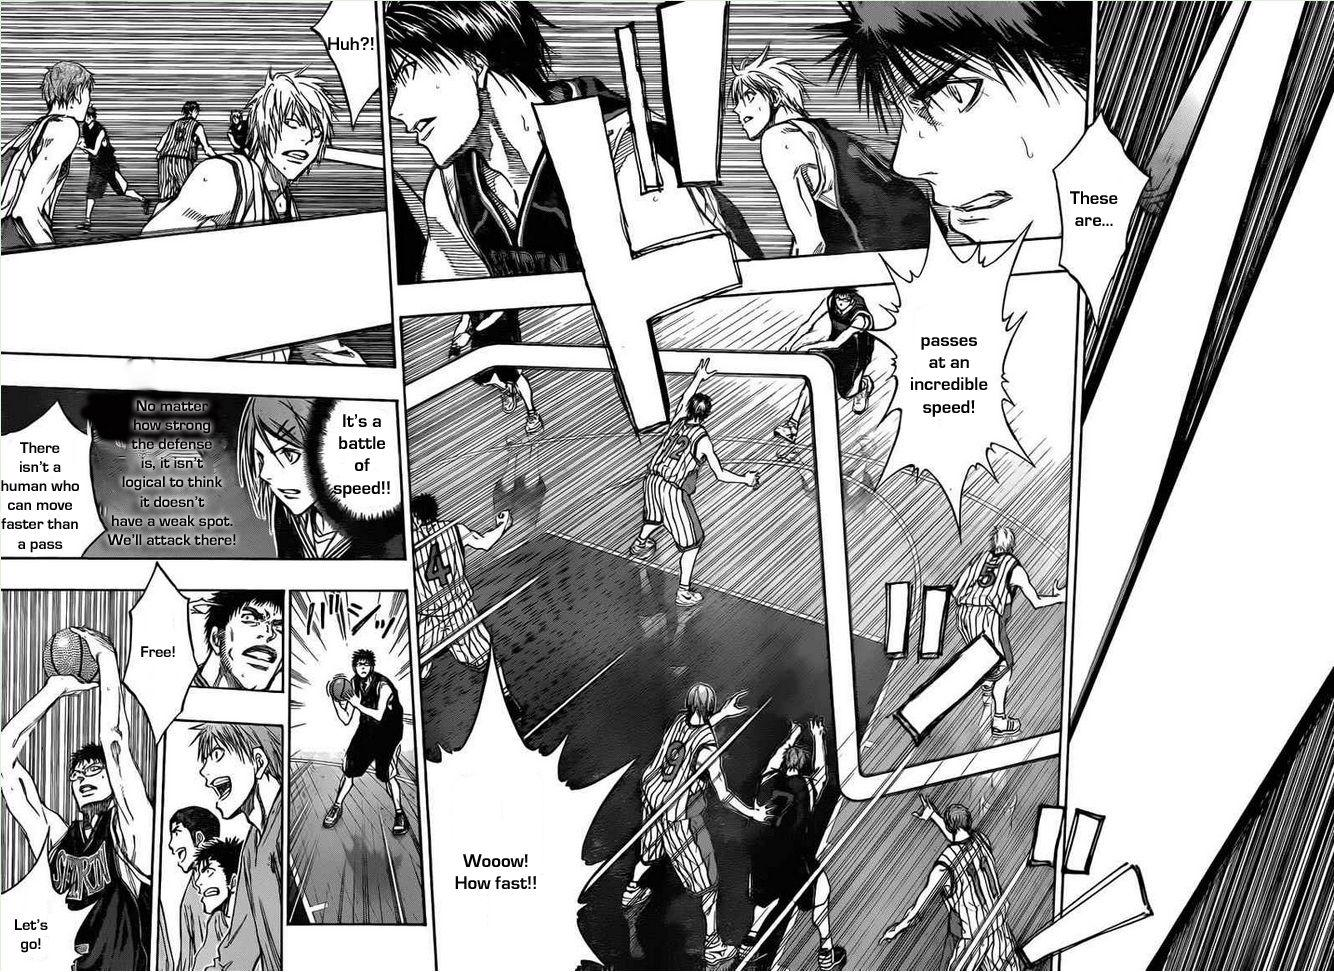 Kuroko no Basket Manga Chapter 146 - Image 07-08